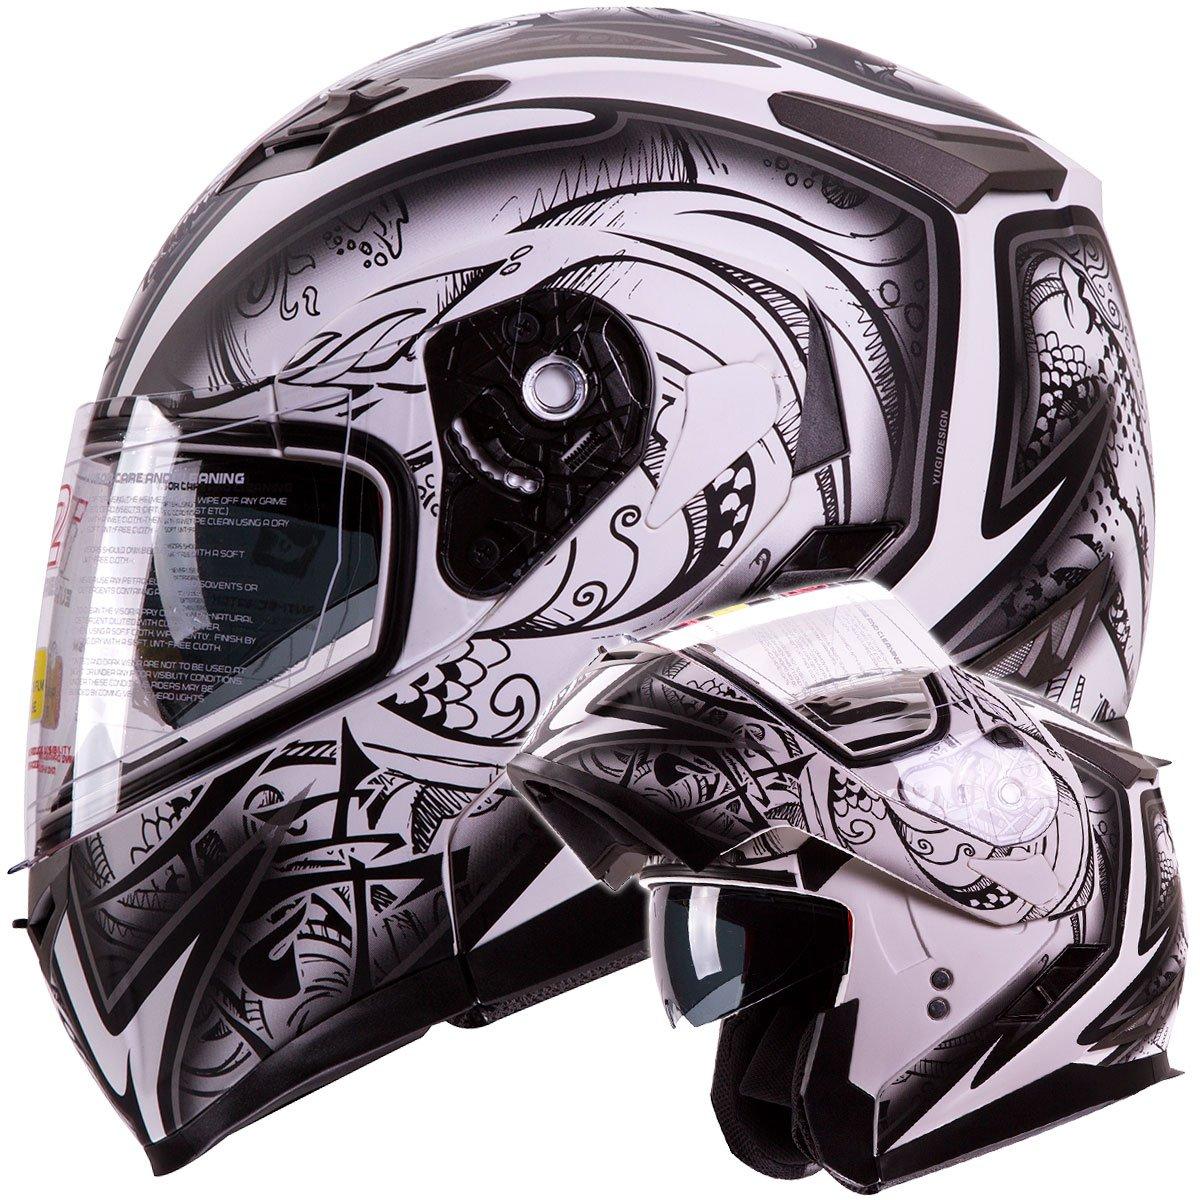 Amazoncom IV DEMON SAMURAI Dual Visor Modular FlipUp - Motorcycle helmet decals graphicsmotorcycle helmet graphics the easy helmet upgrade